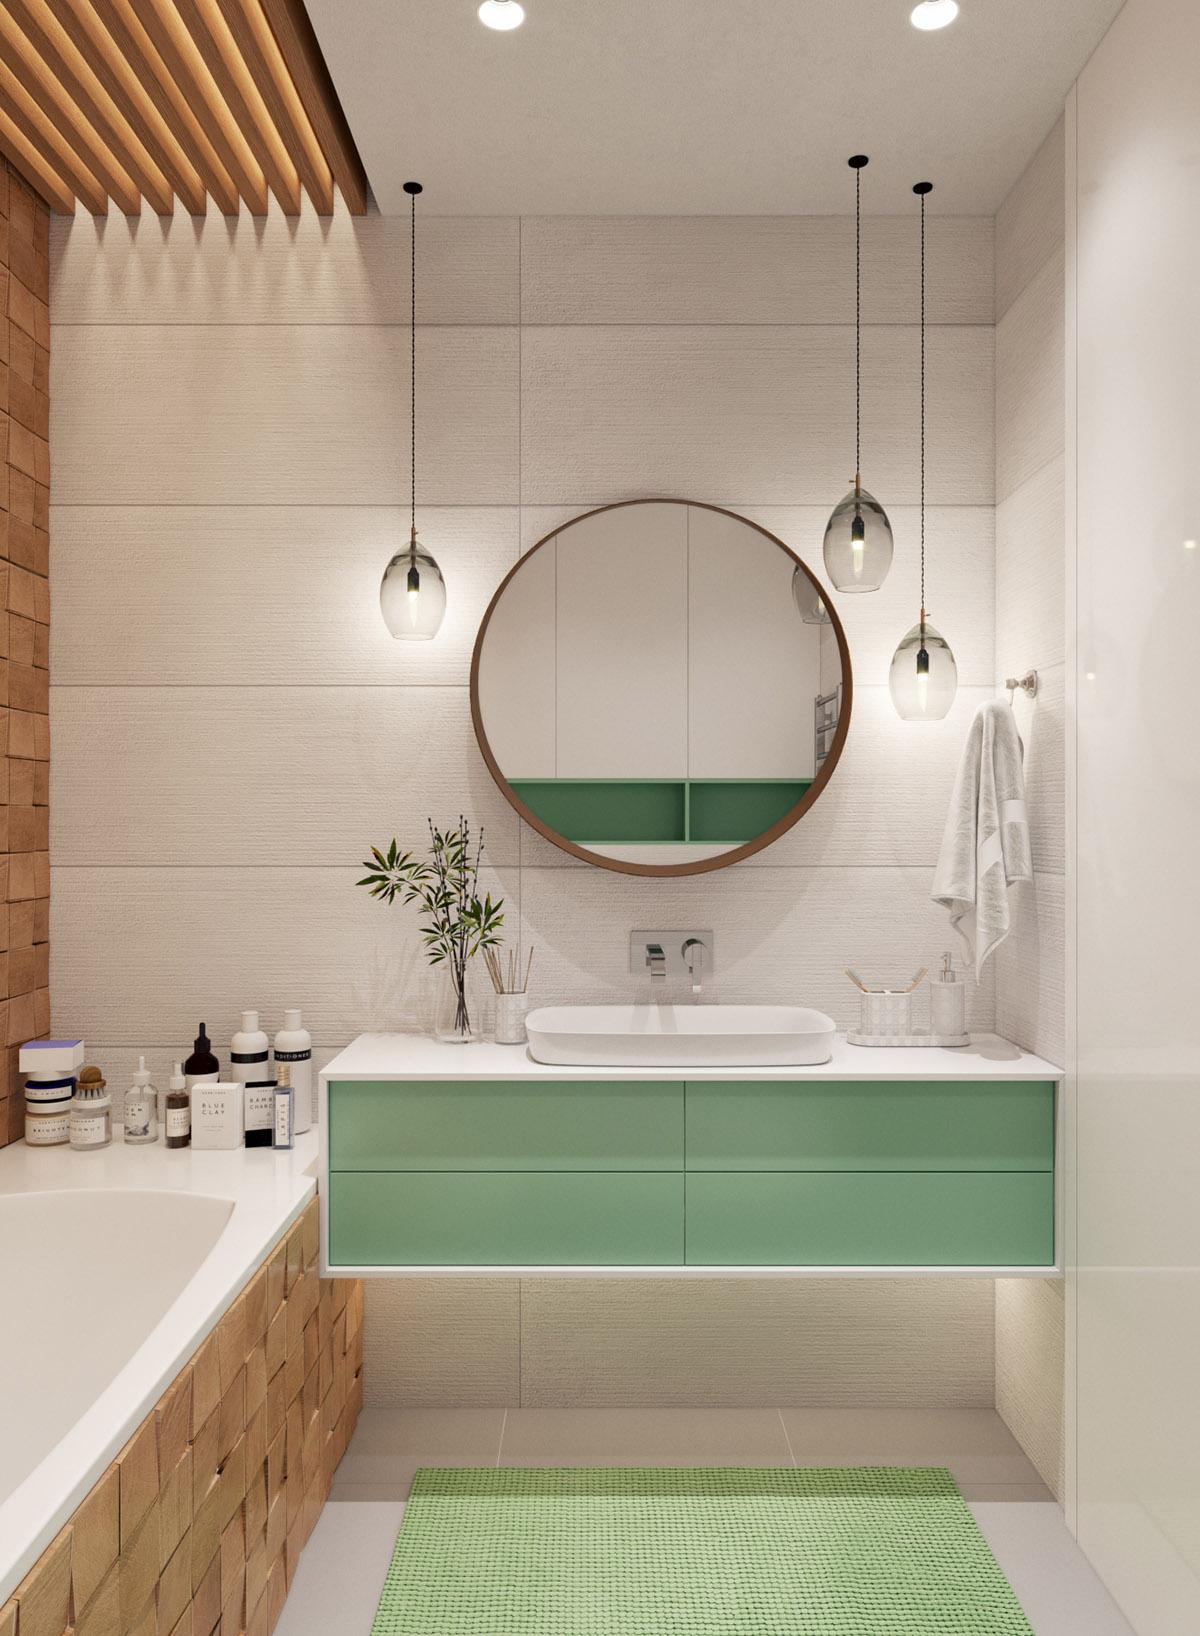 green-and-white-bathroom-design